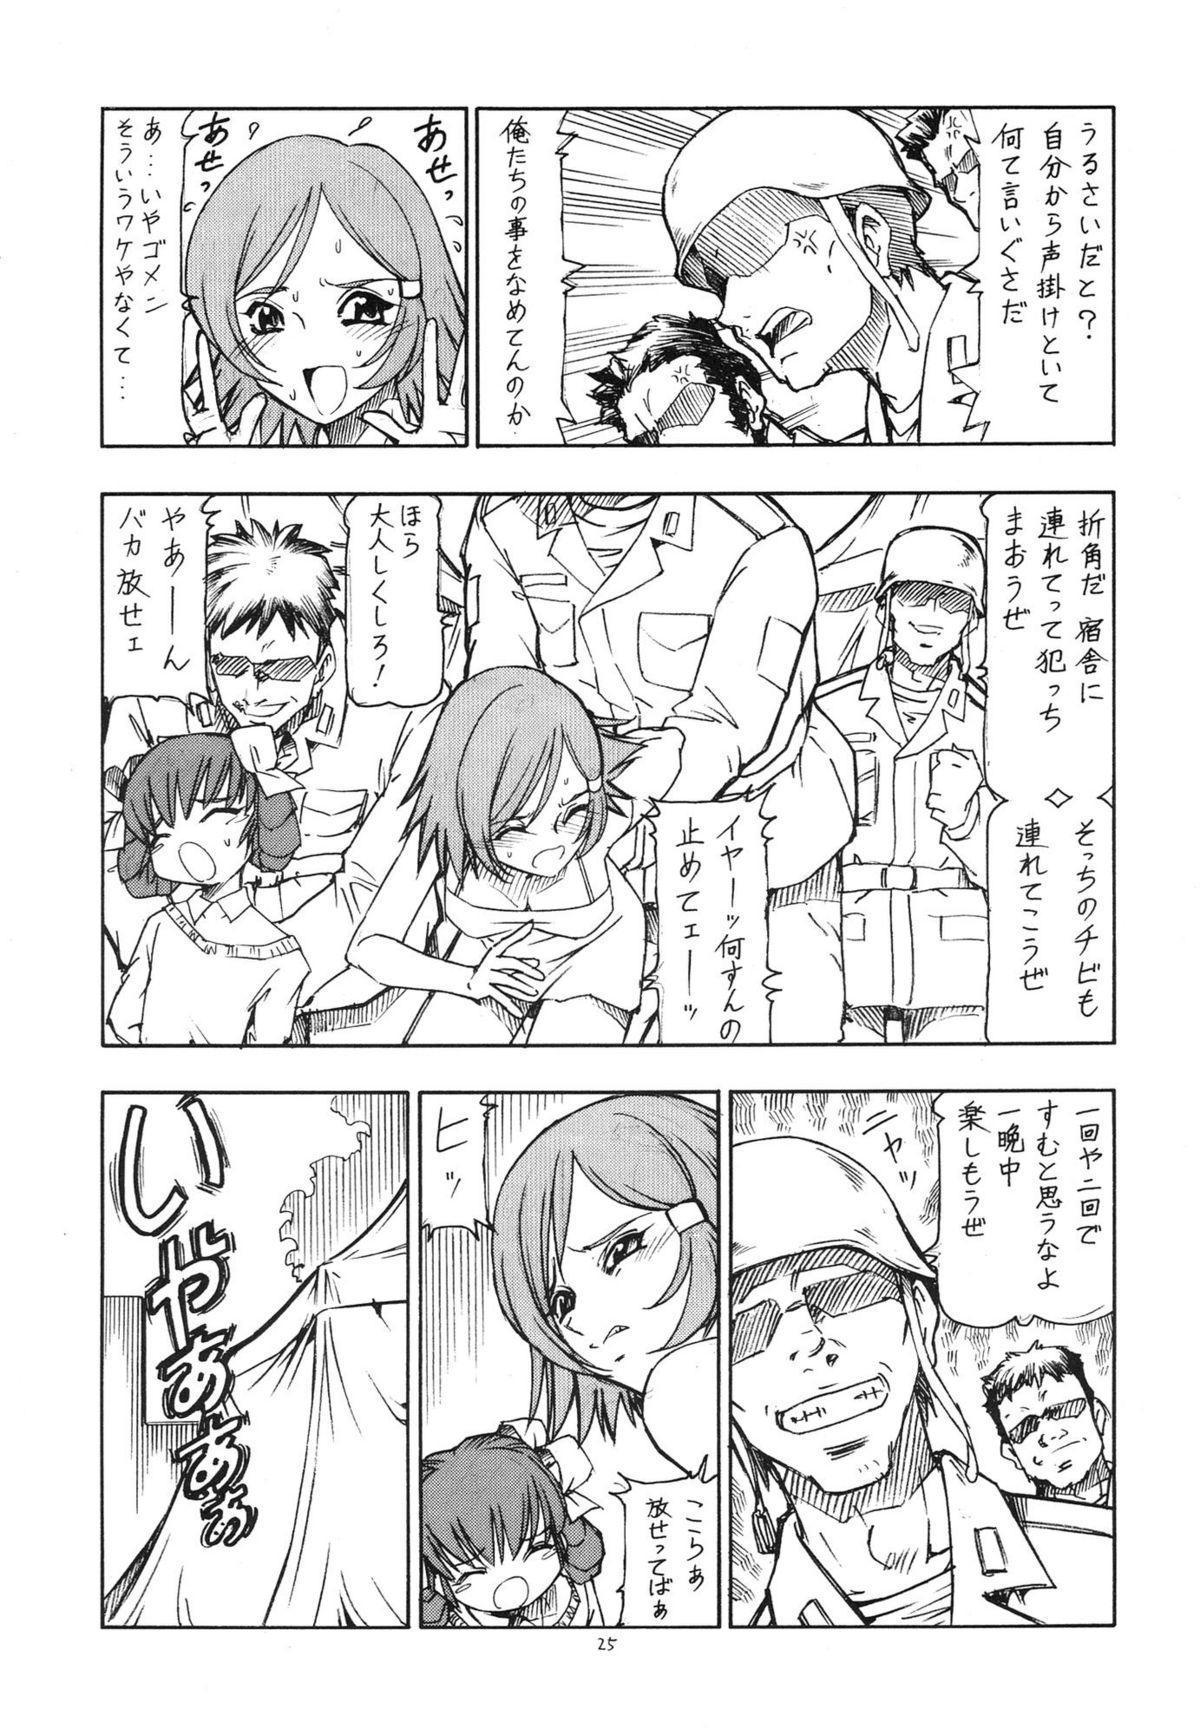 GPM.XXX Animation Moegiiro no Namida - Tear Drops 26